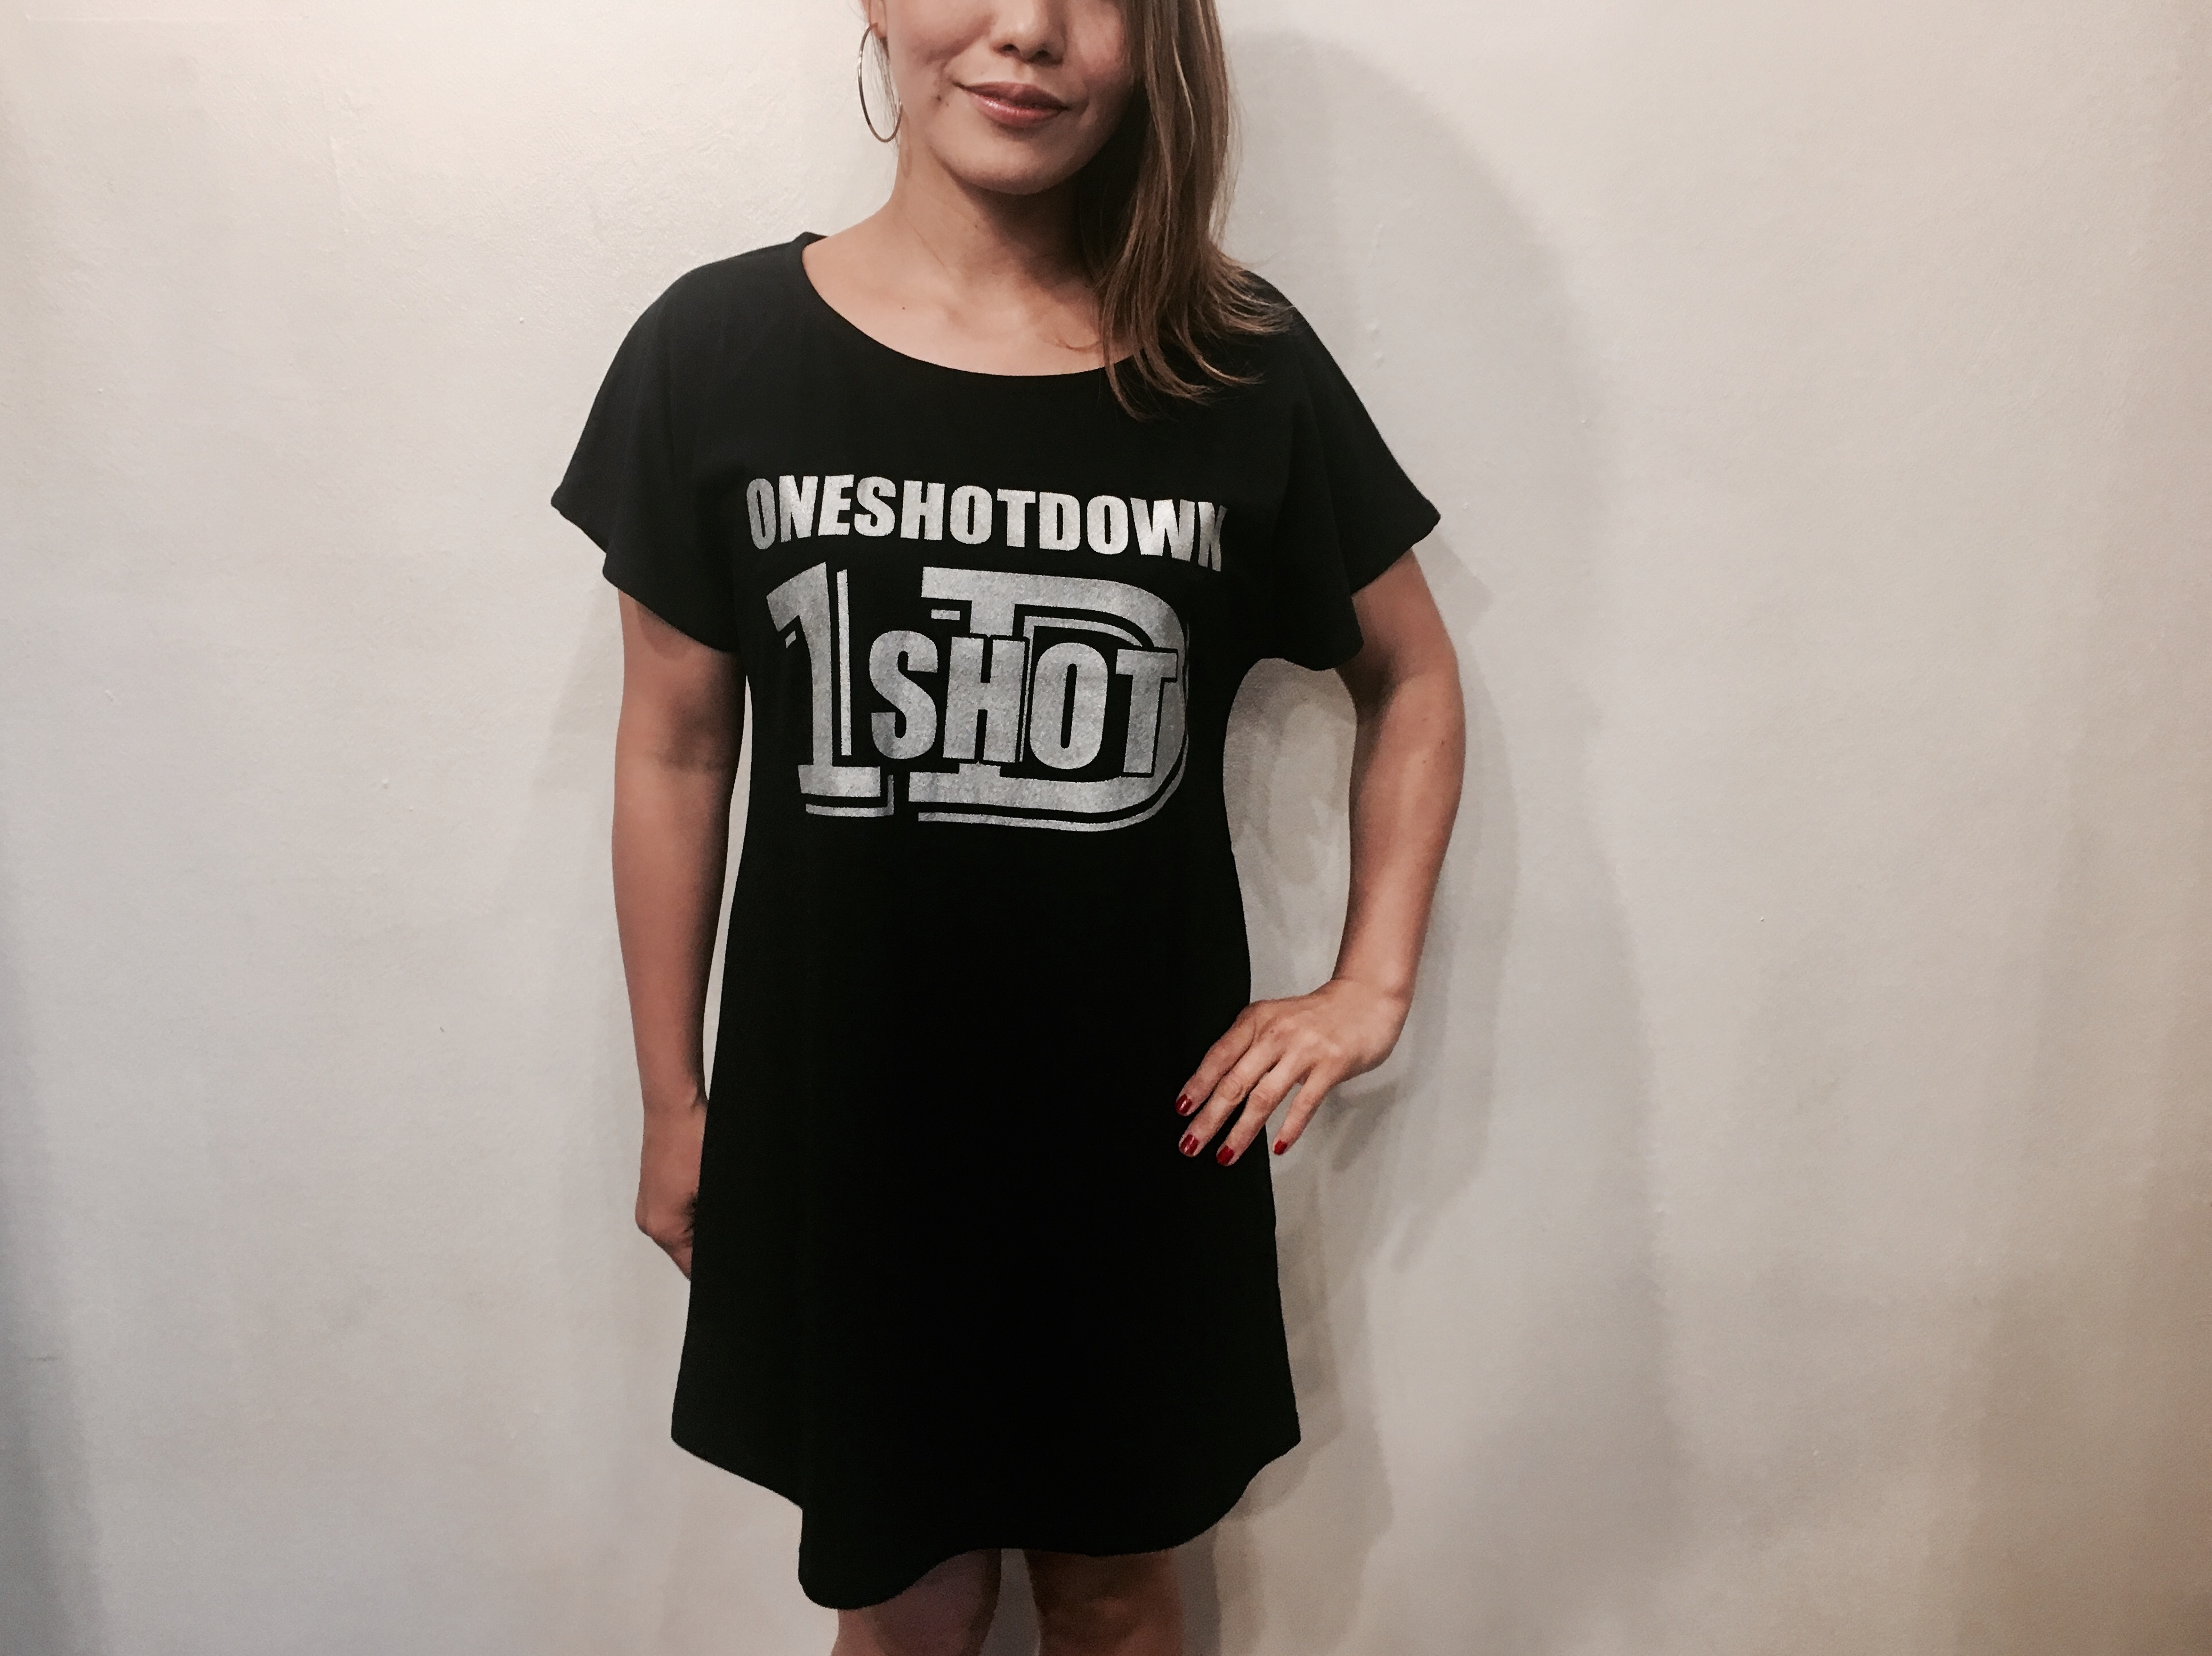 ONESHOTDOWN ガールズ ワンピースTシャツ - 画像2